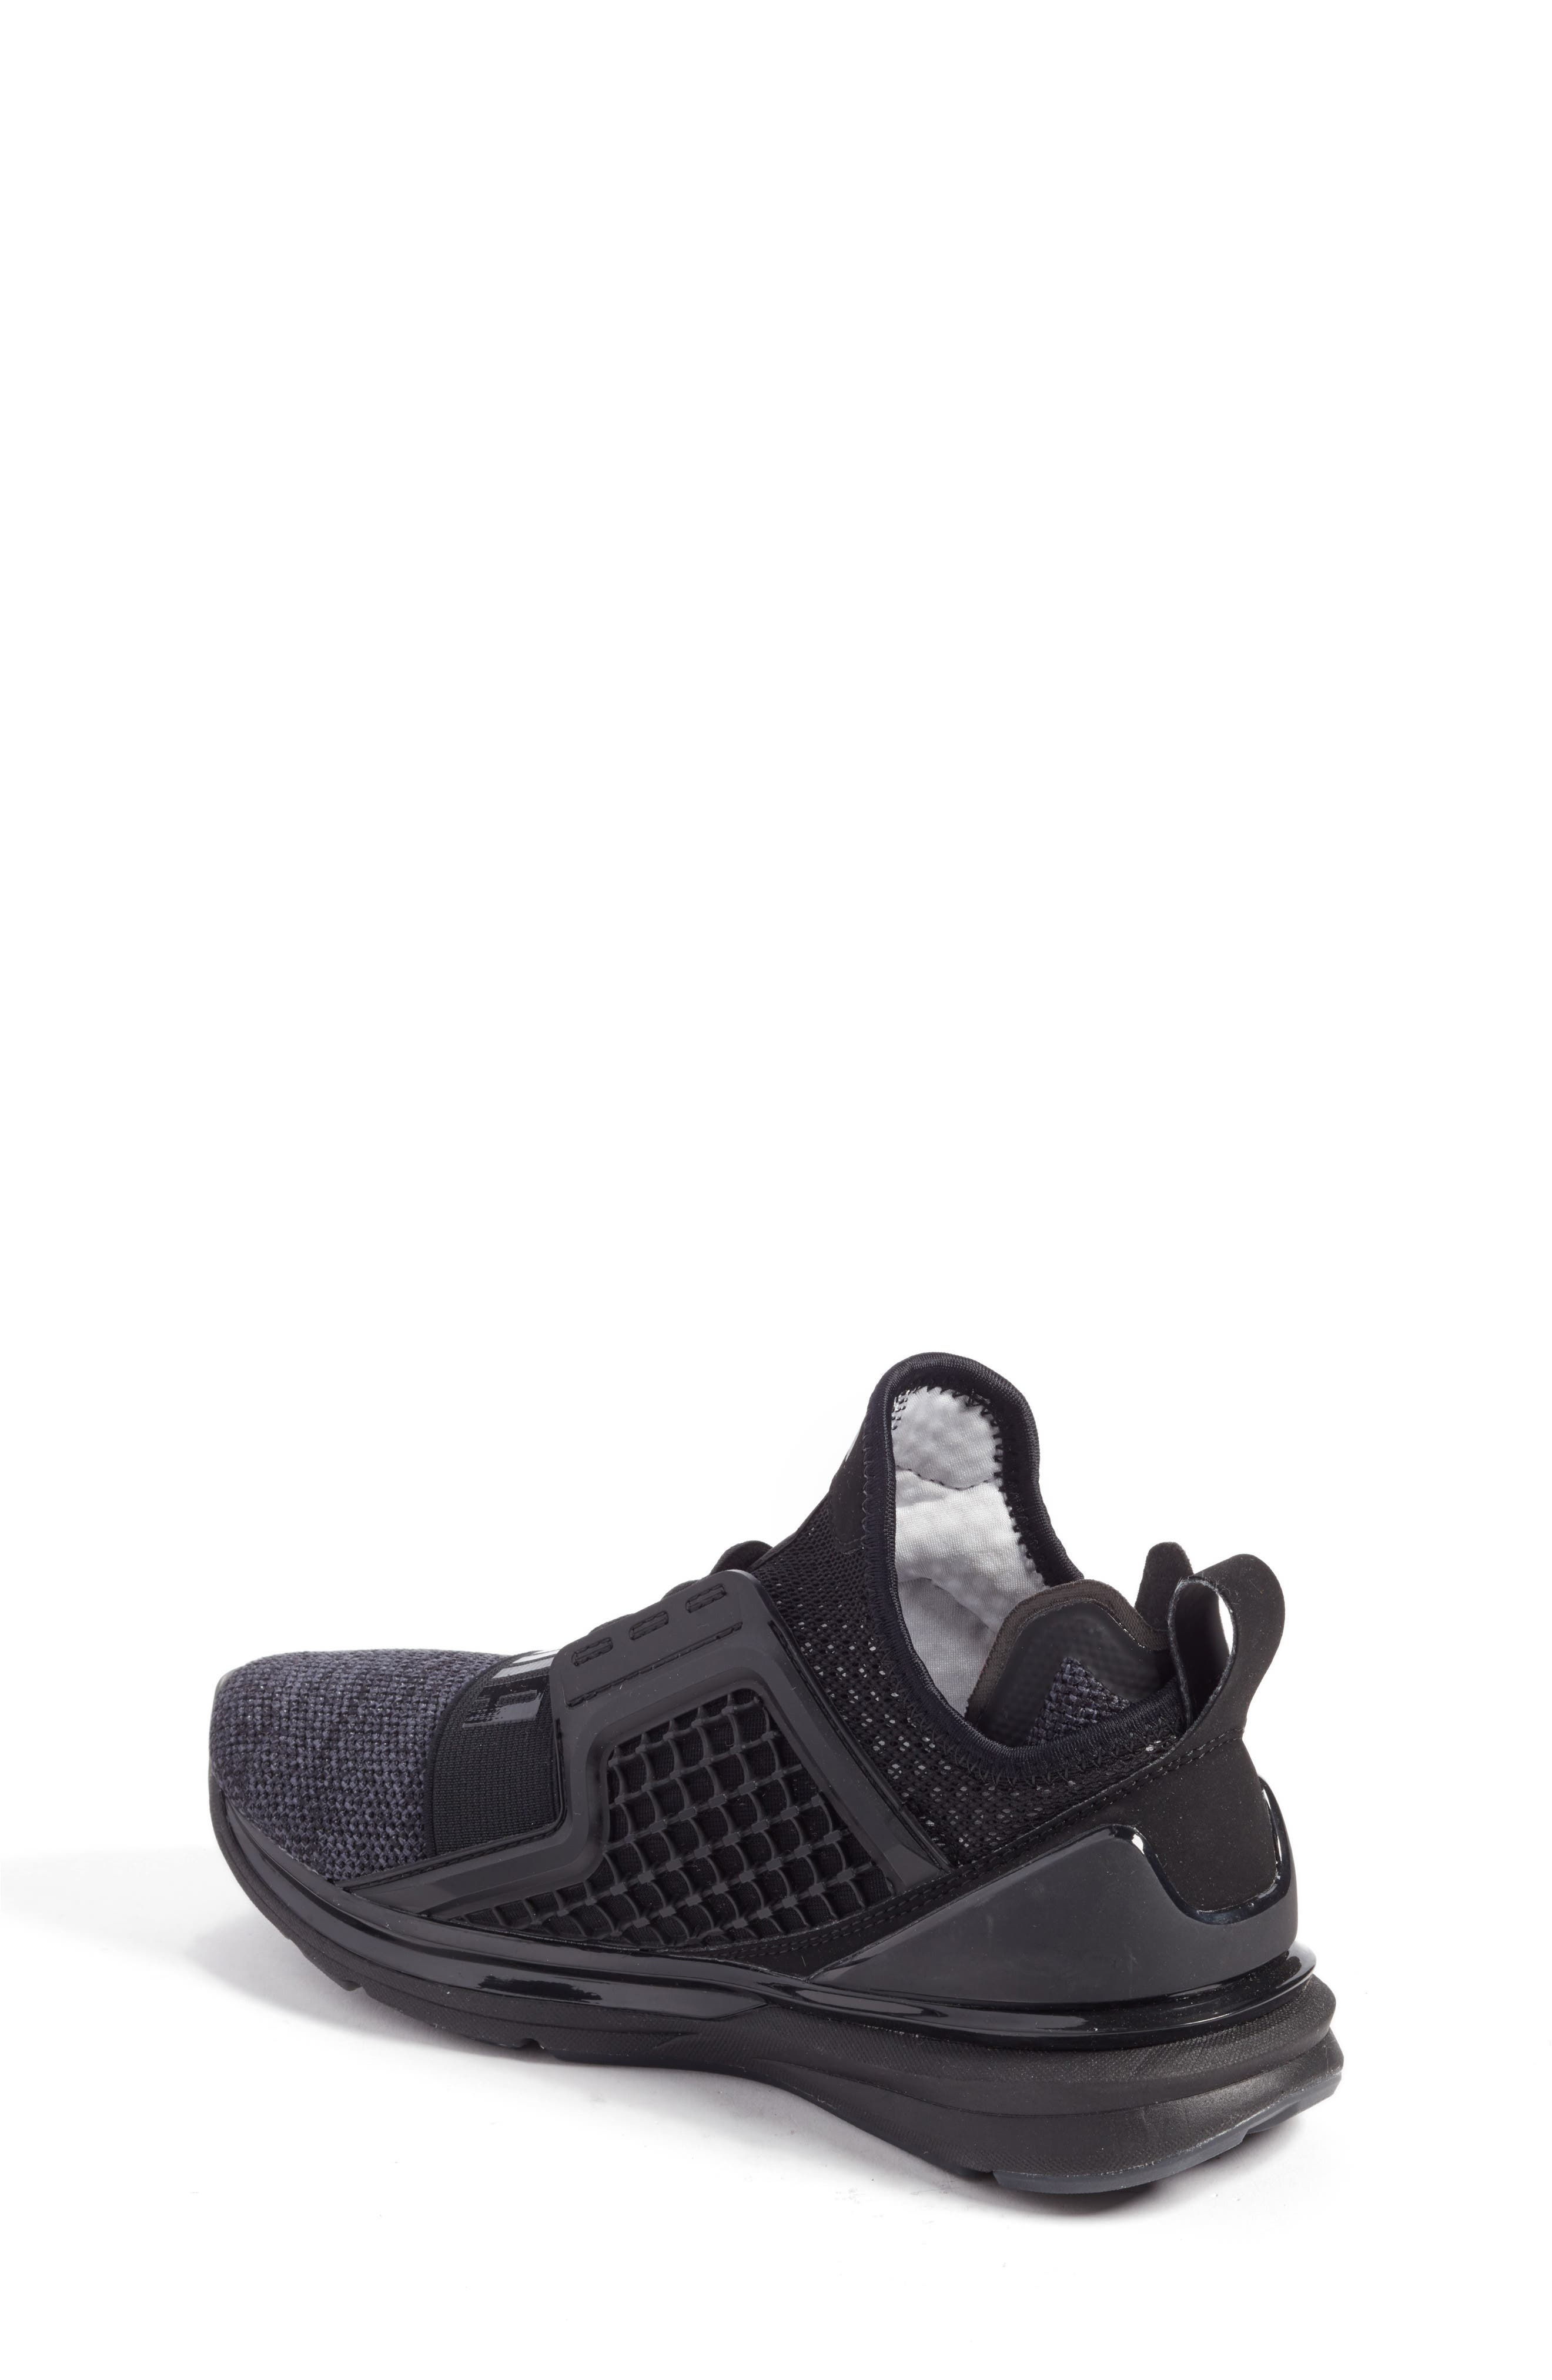 Ignite Limitless Sneaker,                             Alternate thumbnail 2, color,                             001